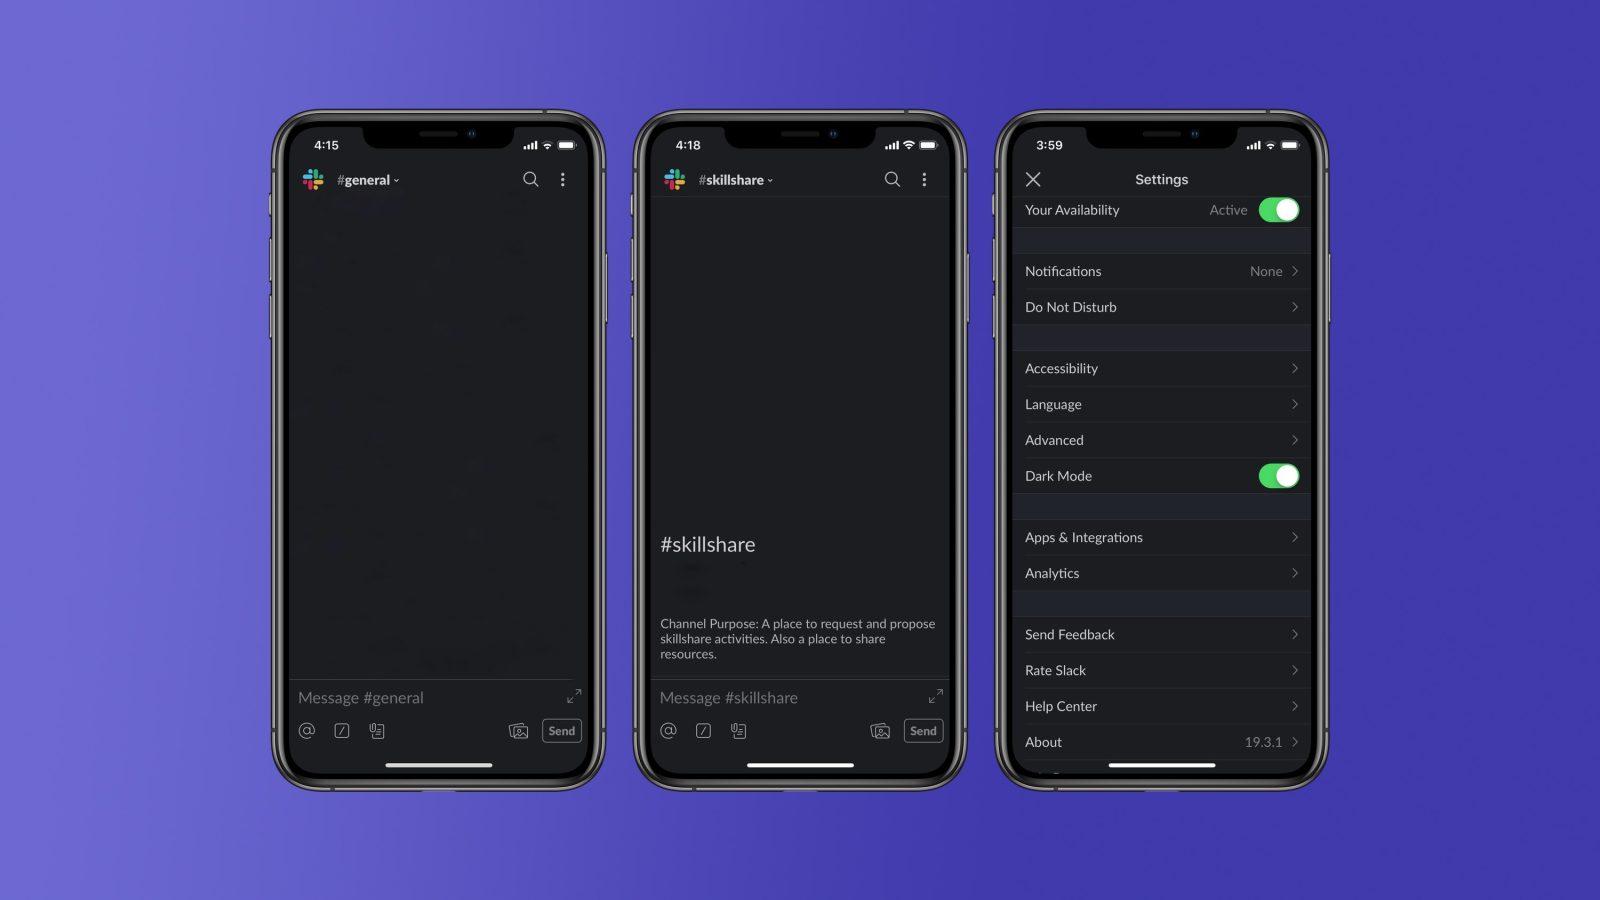 Slack begins testing long-awaited Dark Mode interface on iOS - 9to5Mac